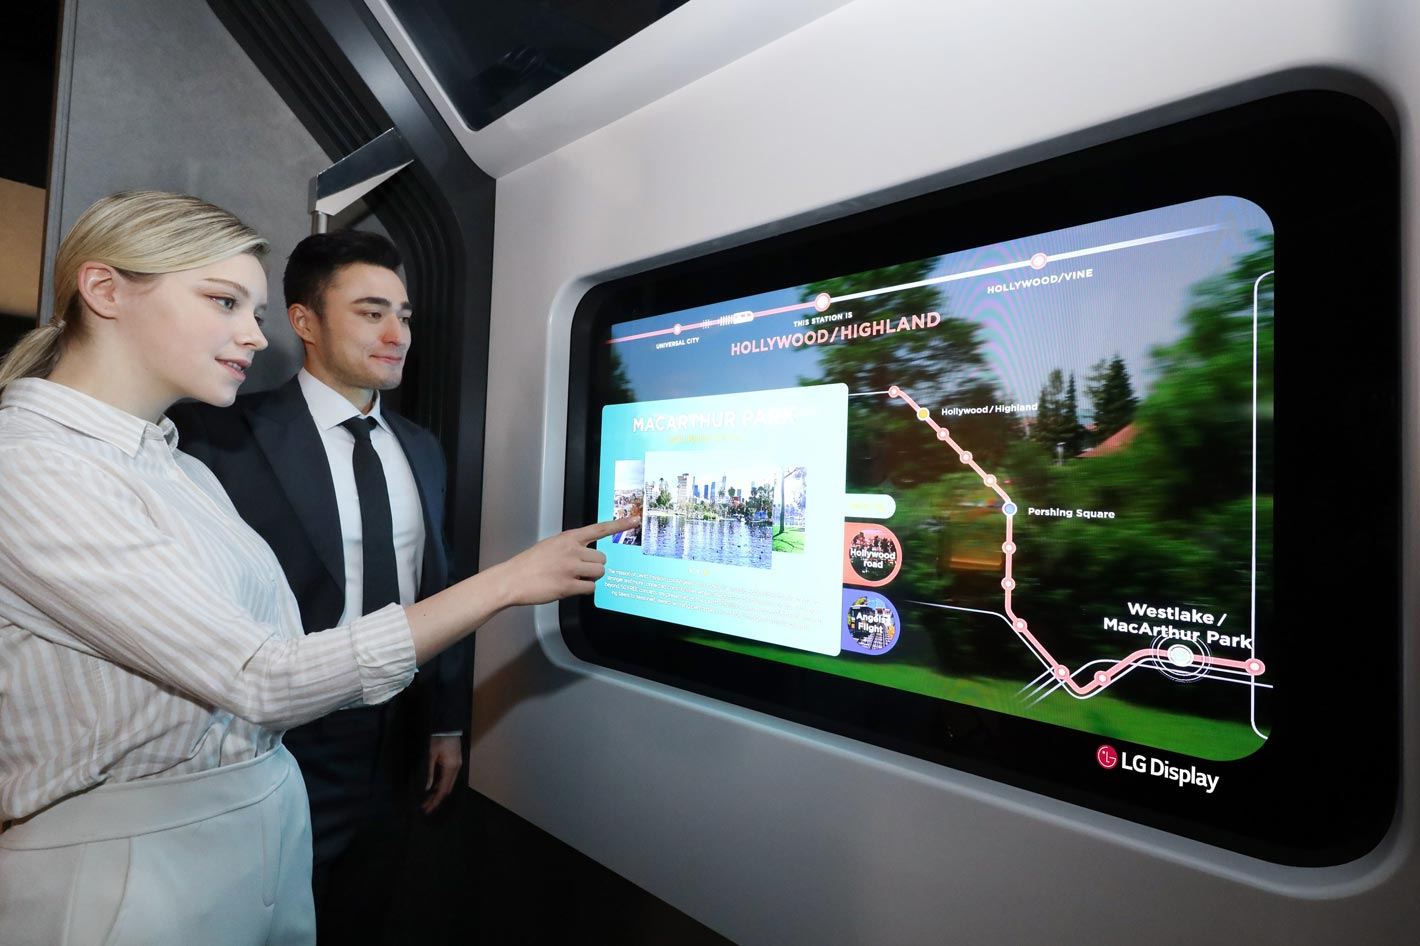 LG Display shows Transparent OLED display at CES 2021